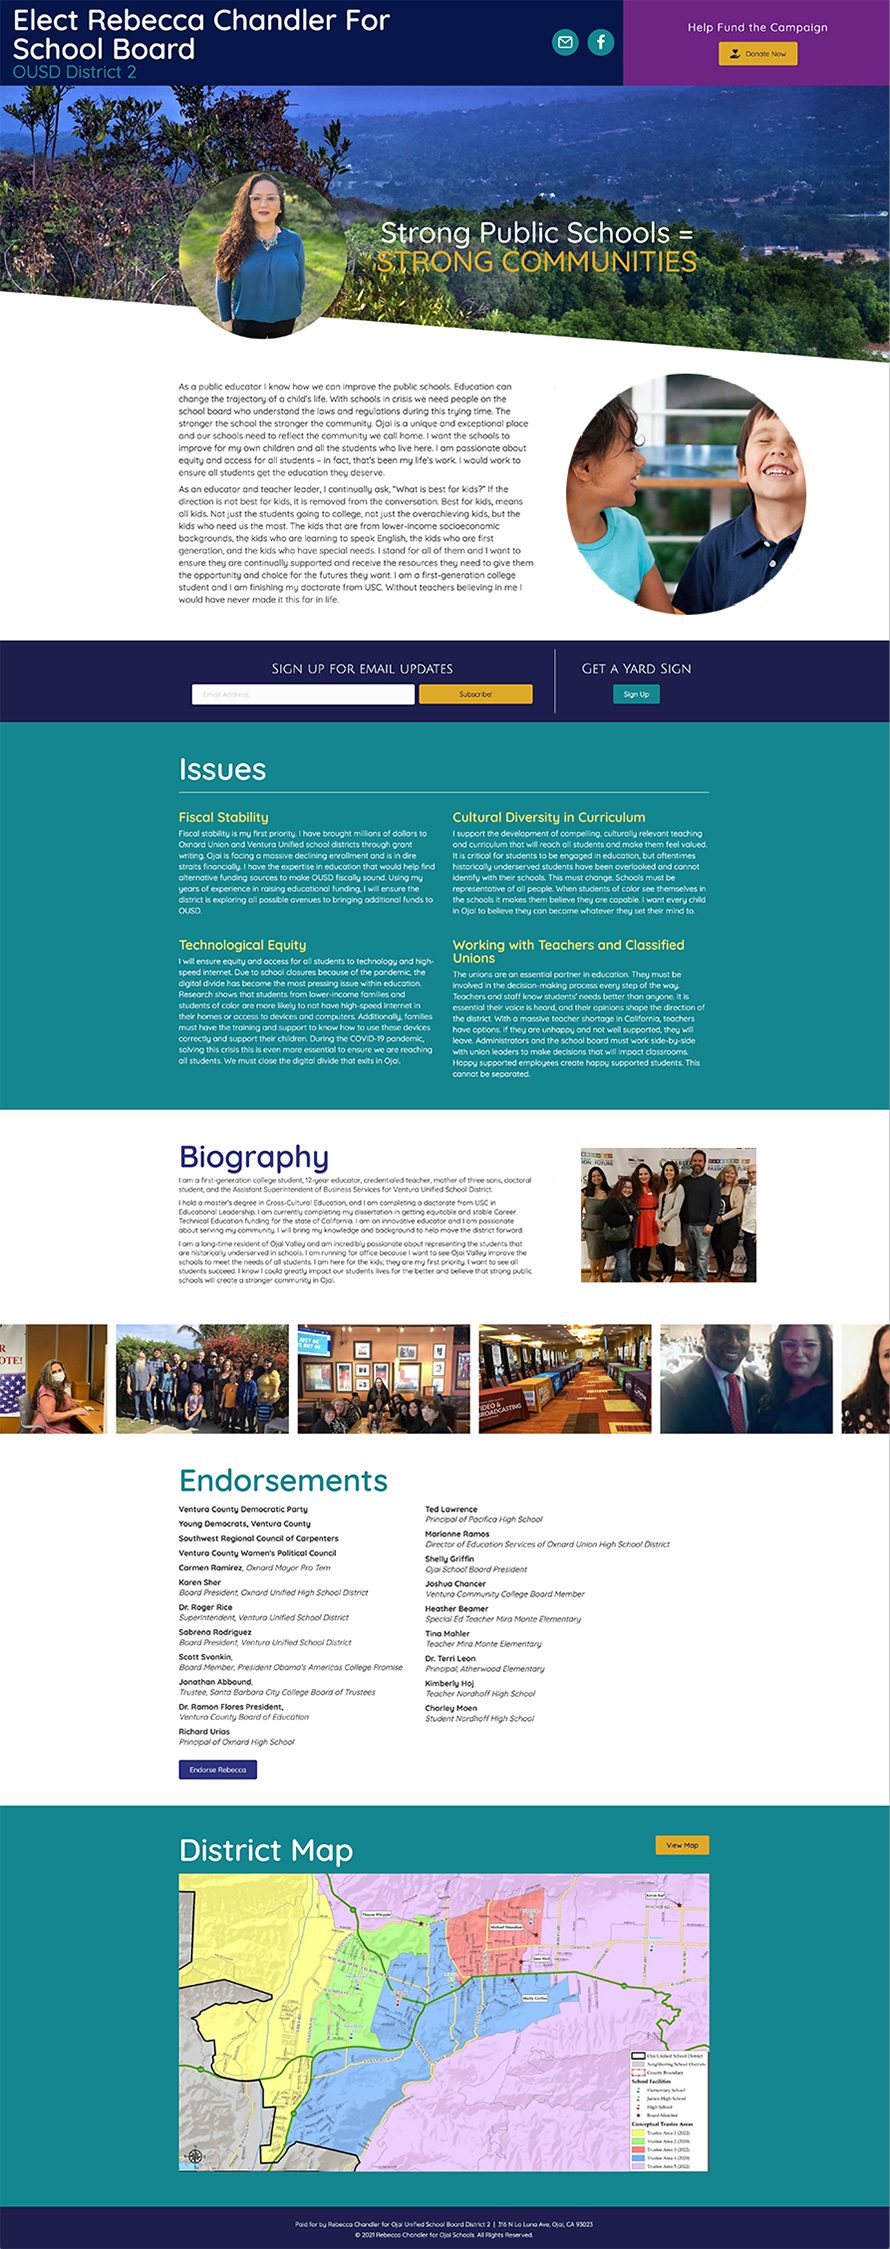 Fullpage screenshot of the Rebecca Chandler for School Board microsite